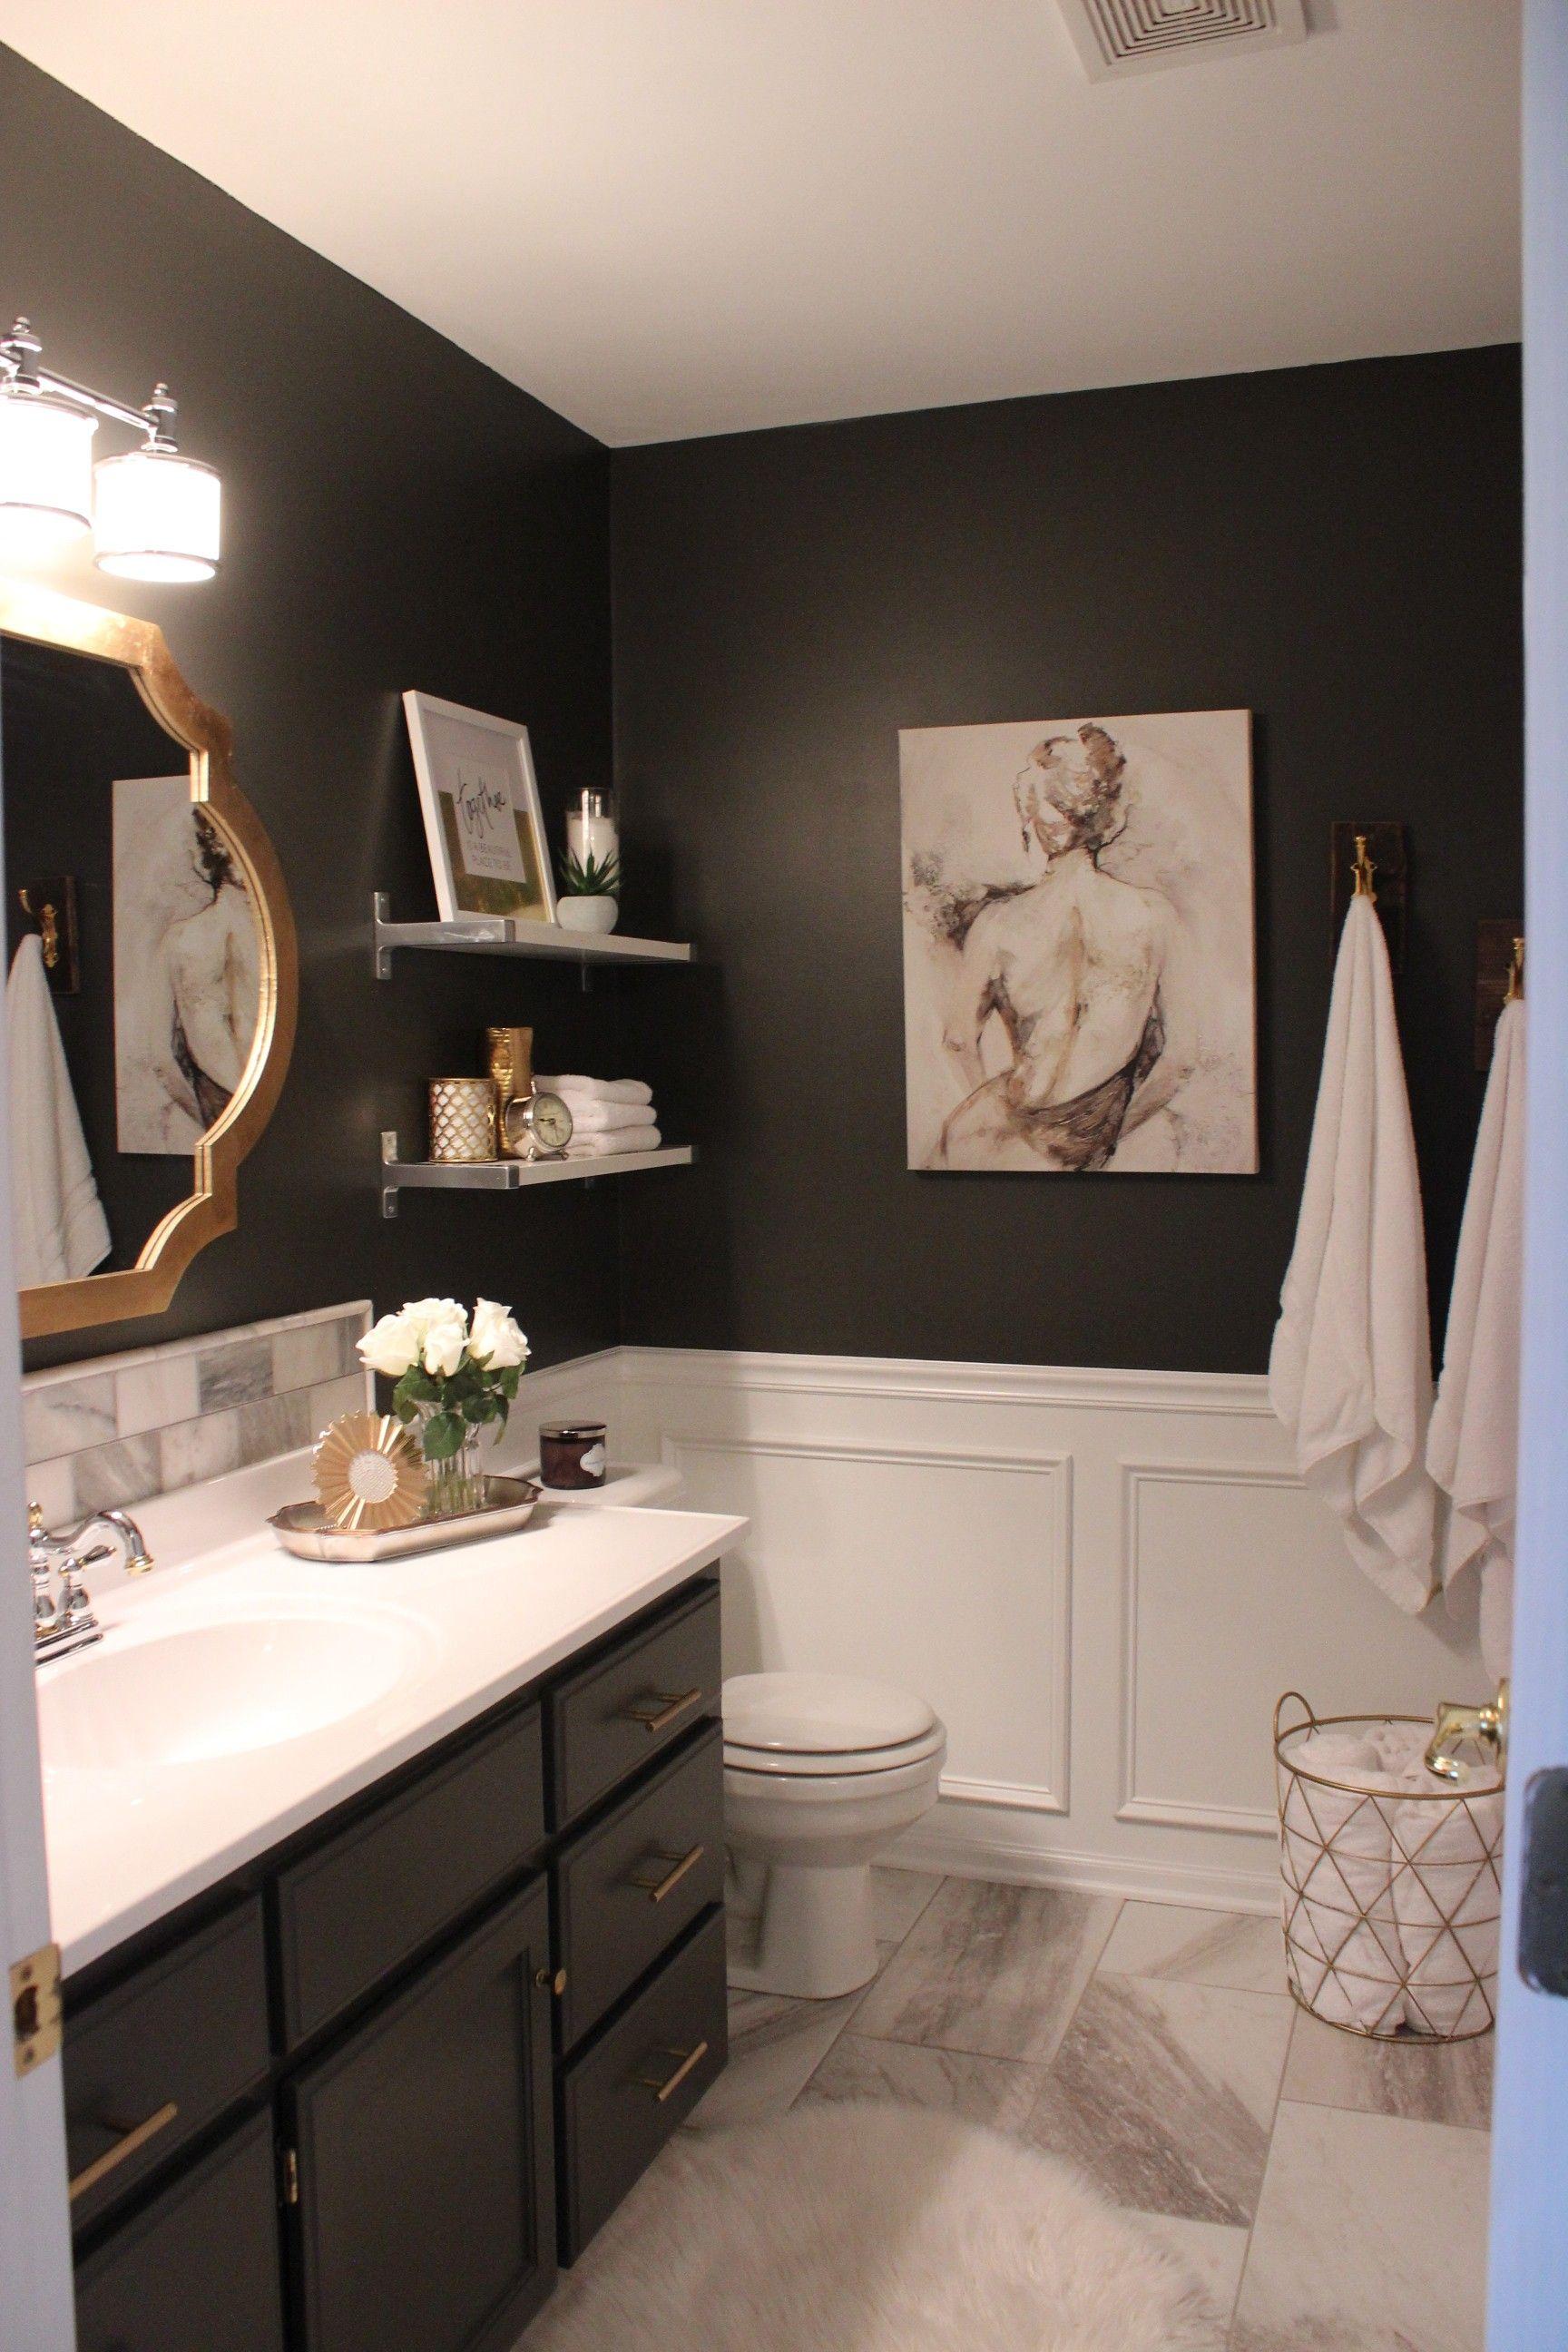 Master Bathroom Tile Dark Walls Gold Bathroom Decor Master Bathroom Makeover Bathroom Remodel Master